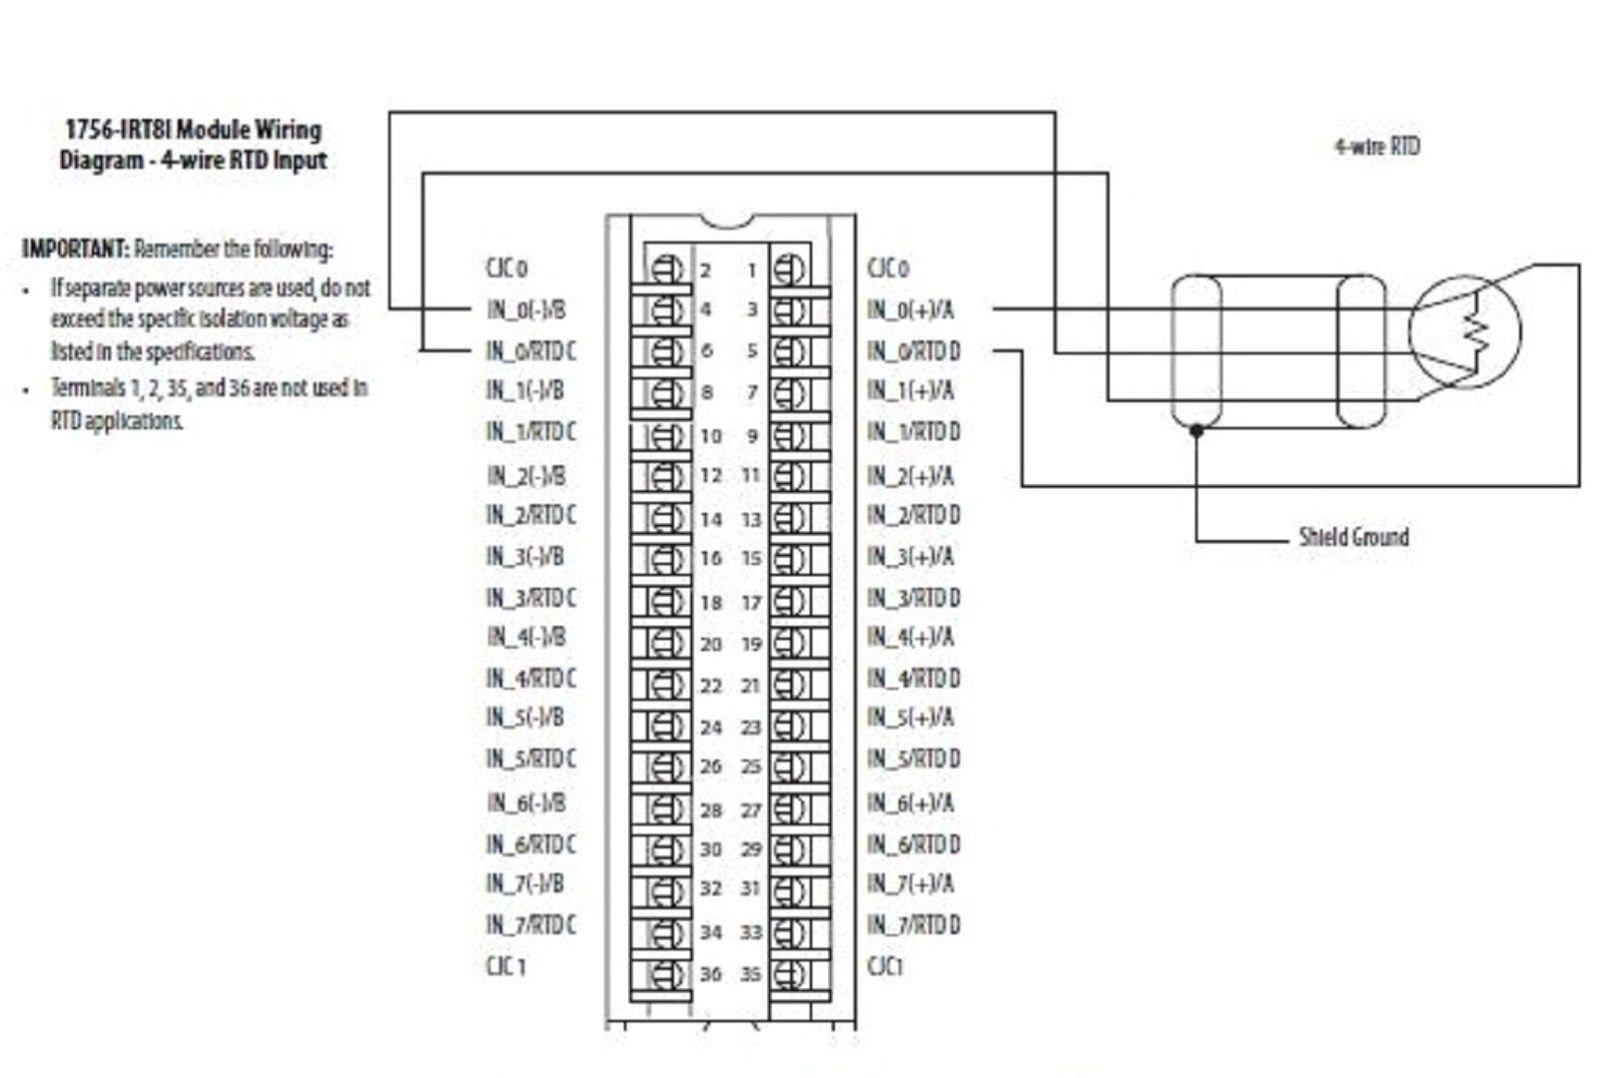 ab wiring diagrams schema diagram databaseab wiring diagrams wiring diagram centre ab wiring diagrams